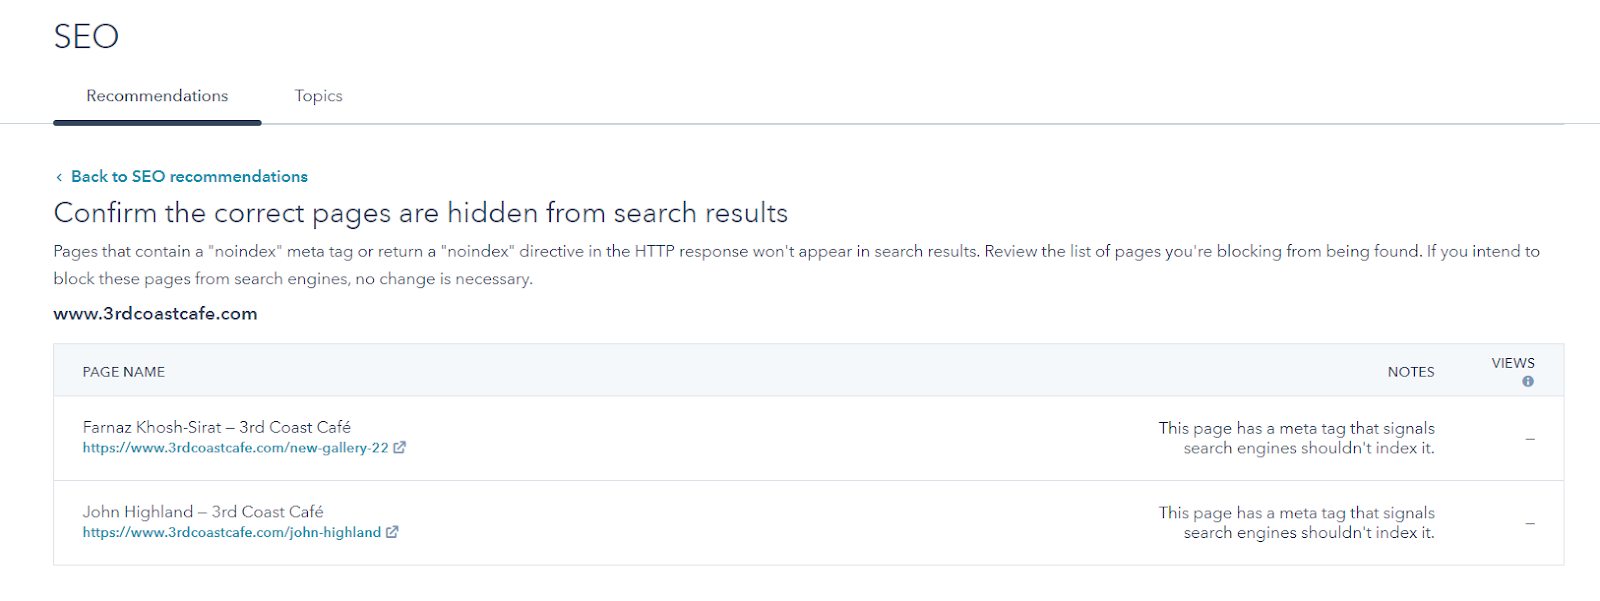 Screenshot of the SEO audit tool in HubSpot